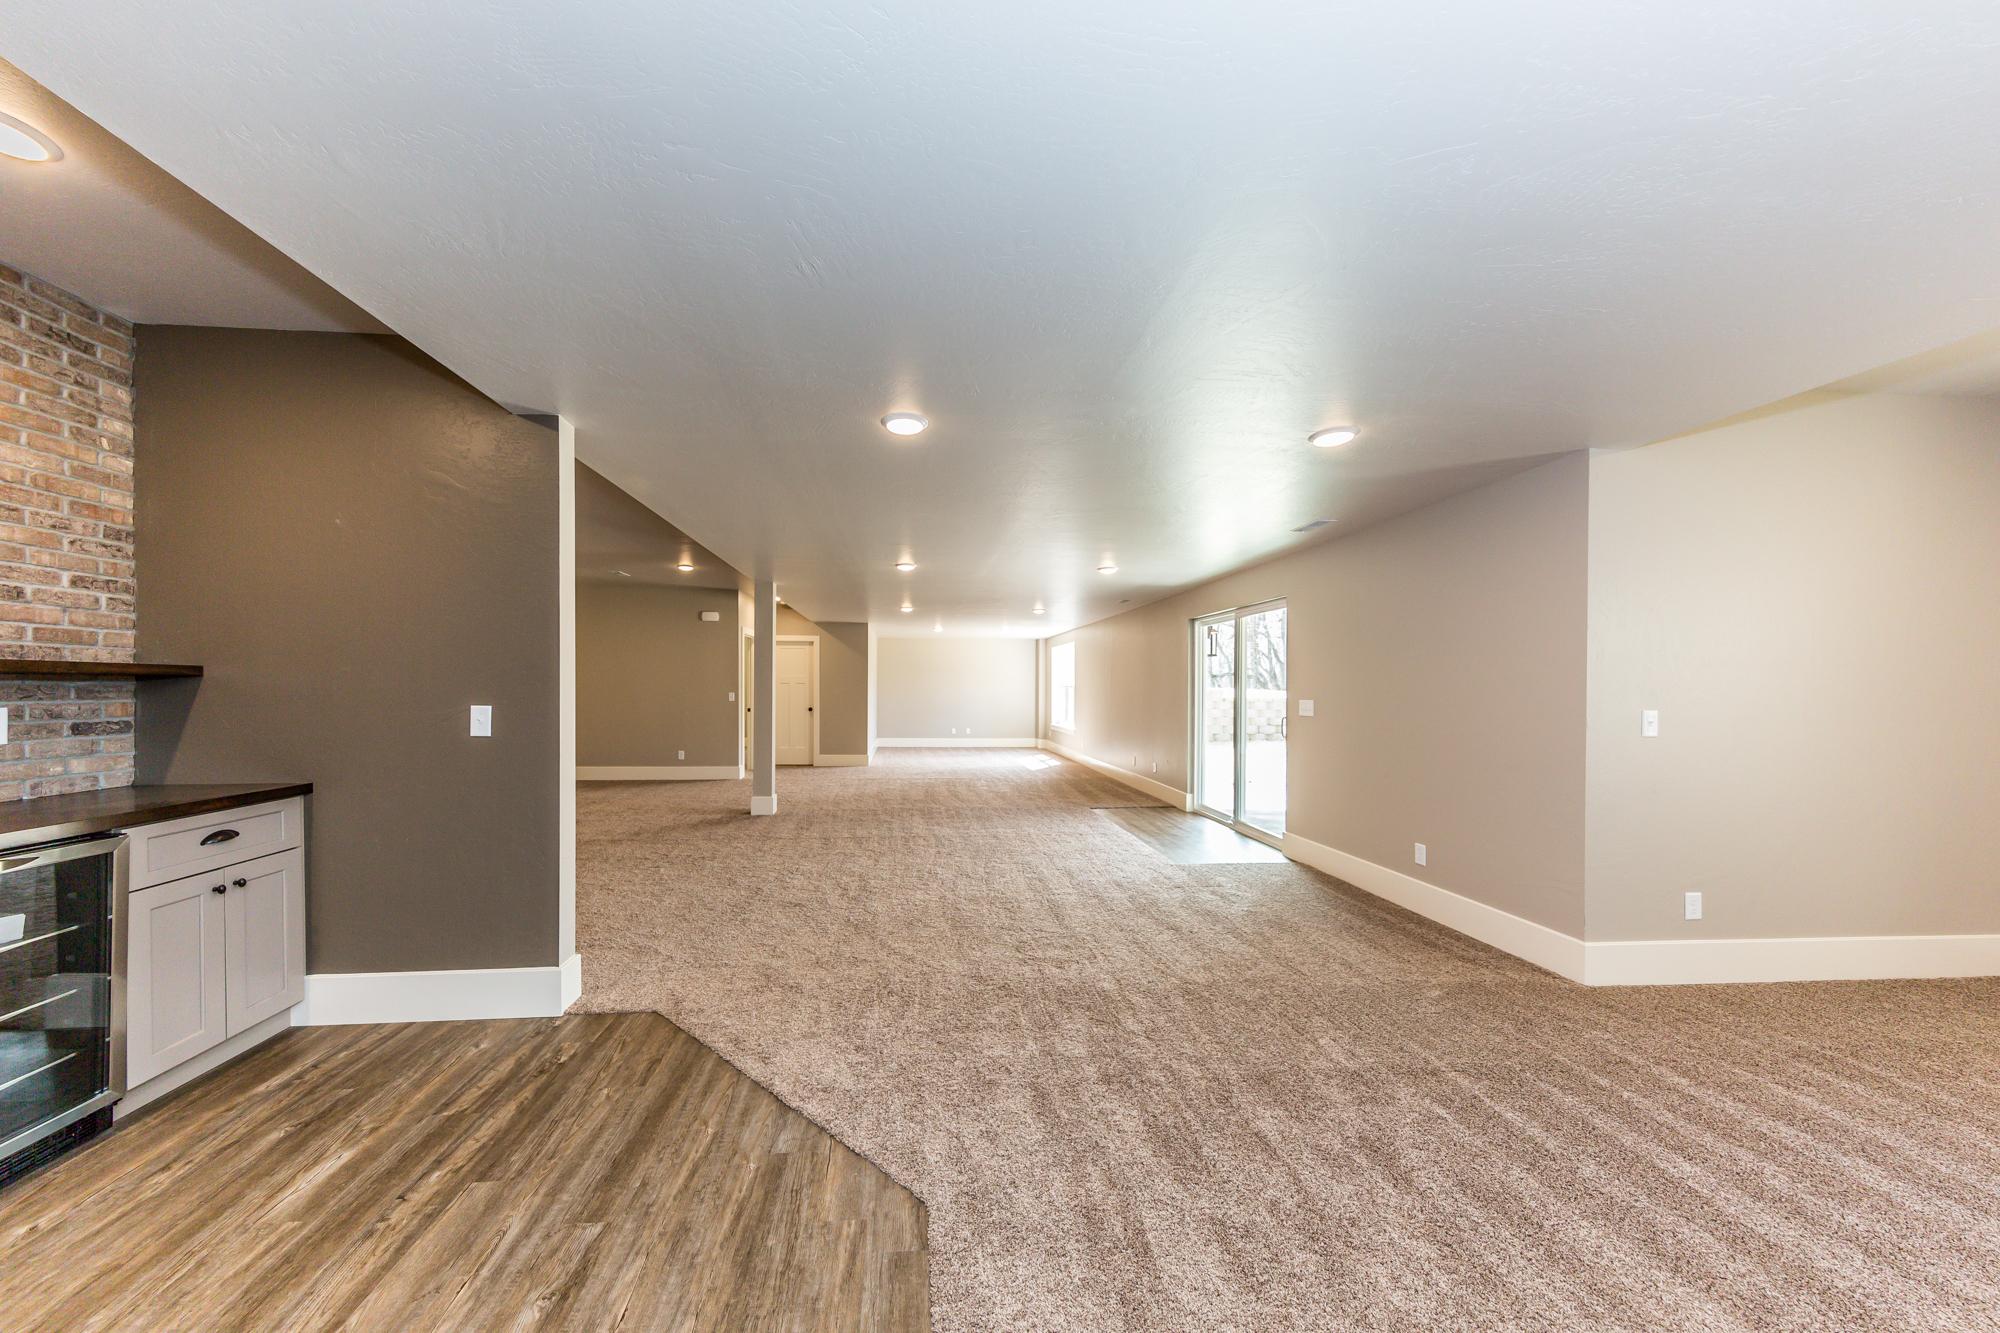 New-Construction-For-Sale-Bethel-Ridge-Farms-Scott-AFB-Illinois-35.jpg